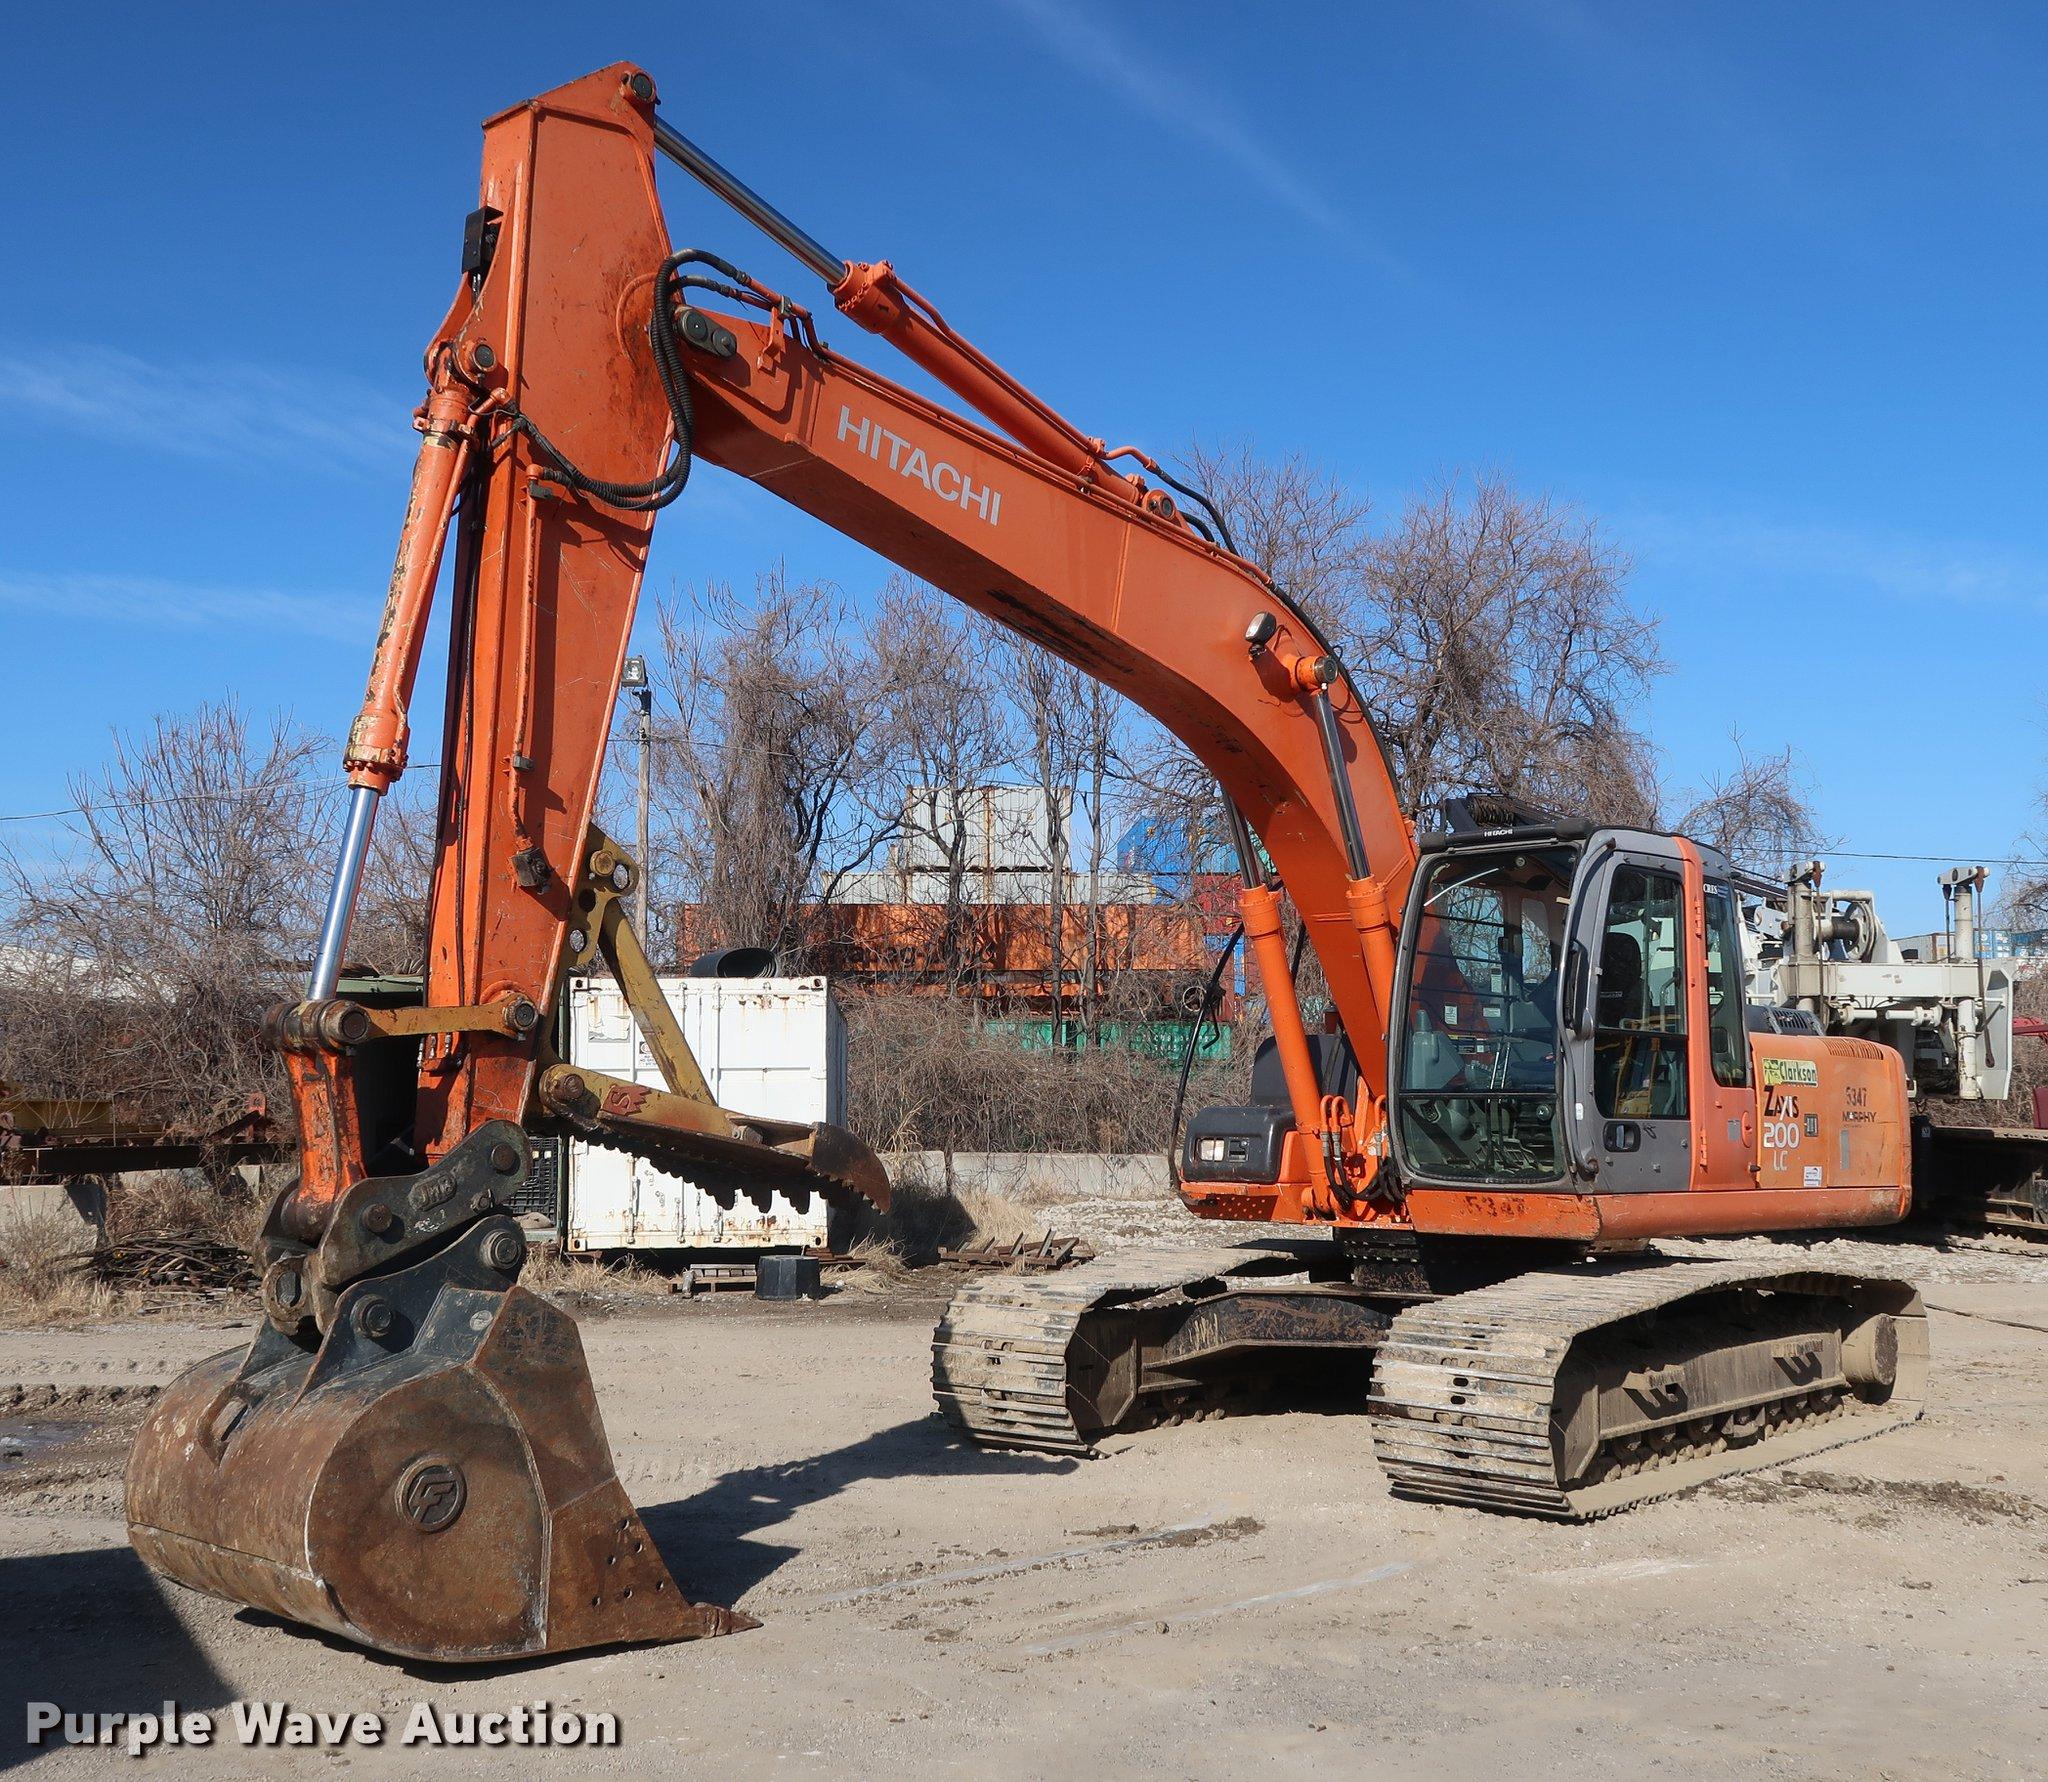 2006 Hitachi ZX200 LC excavator | Item DF3523 | SOLD! March